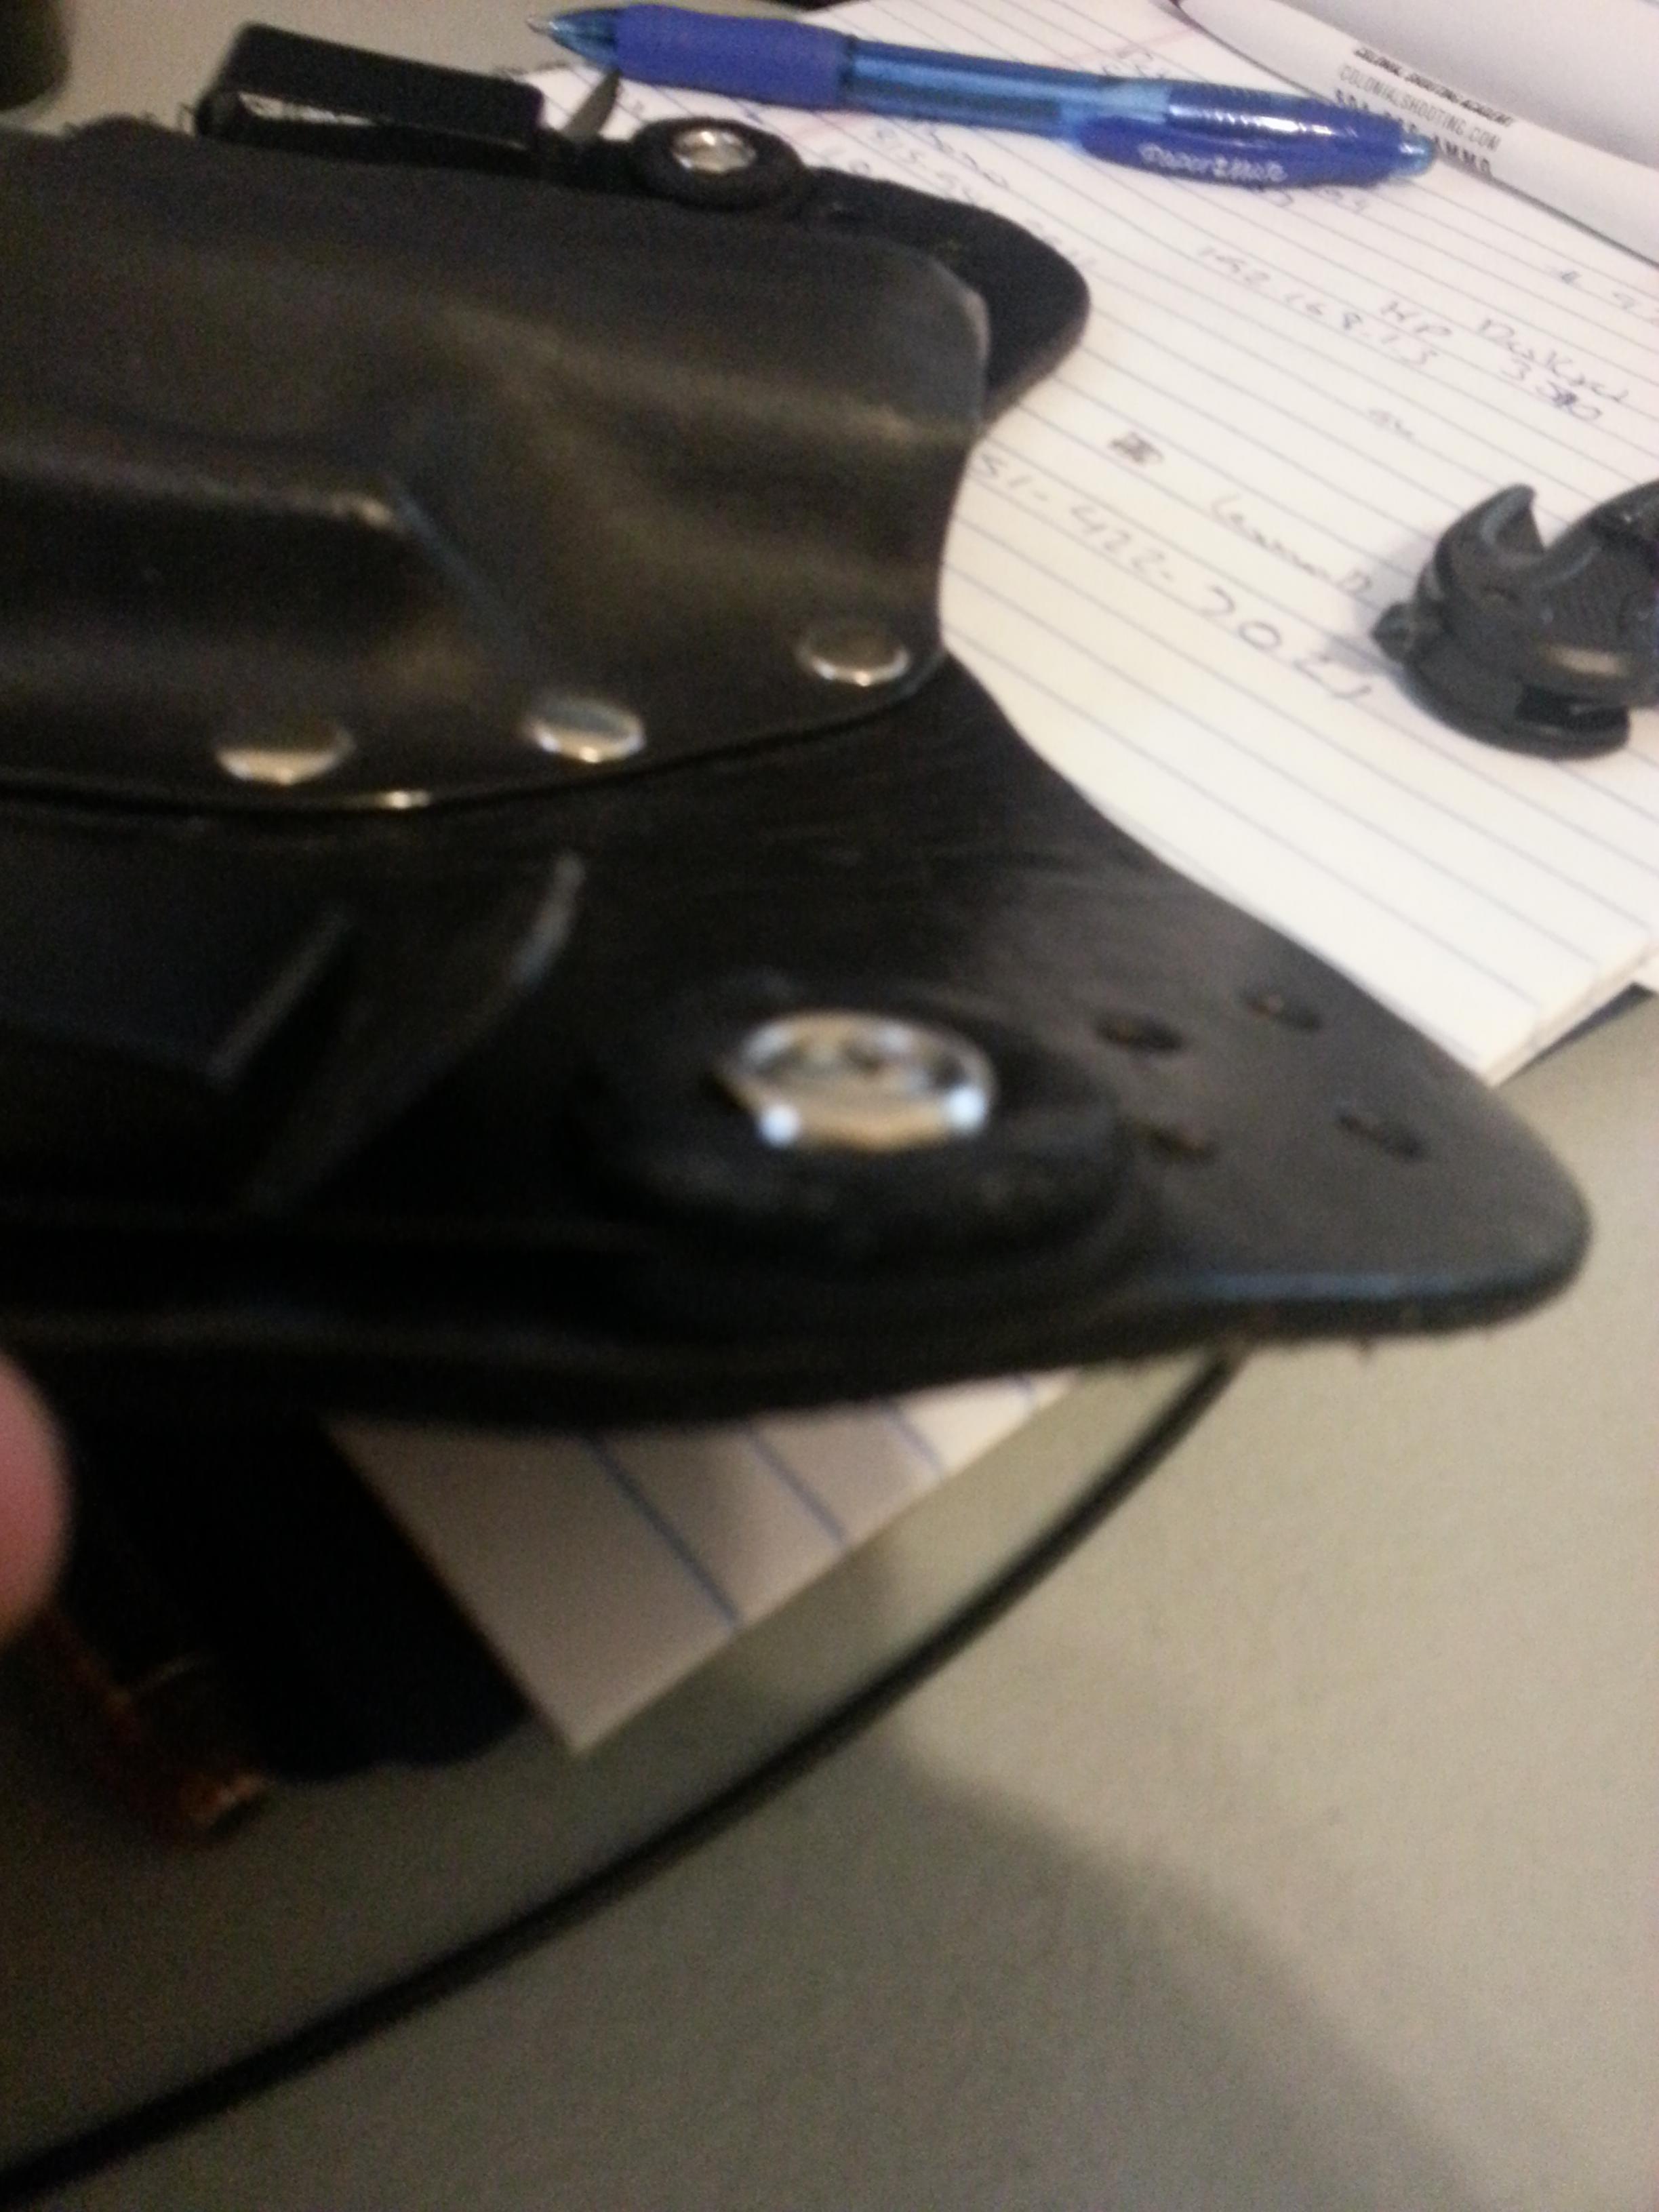 Creaking holster suggestion-2012-11-22-16.36.10.jpg